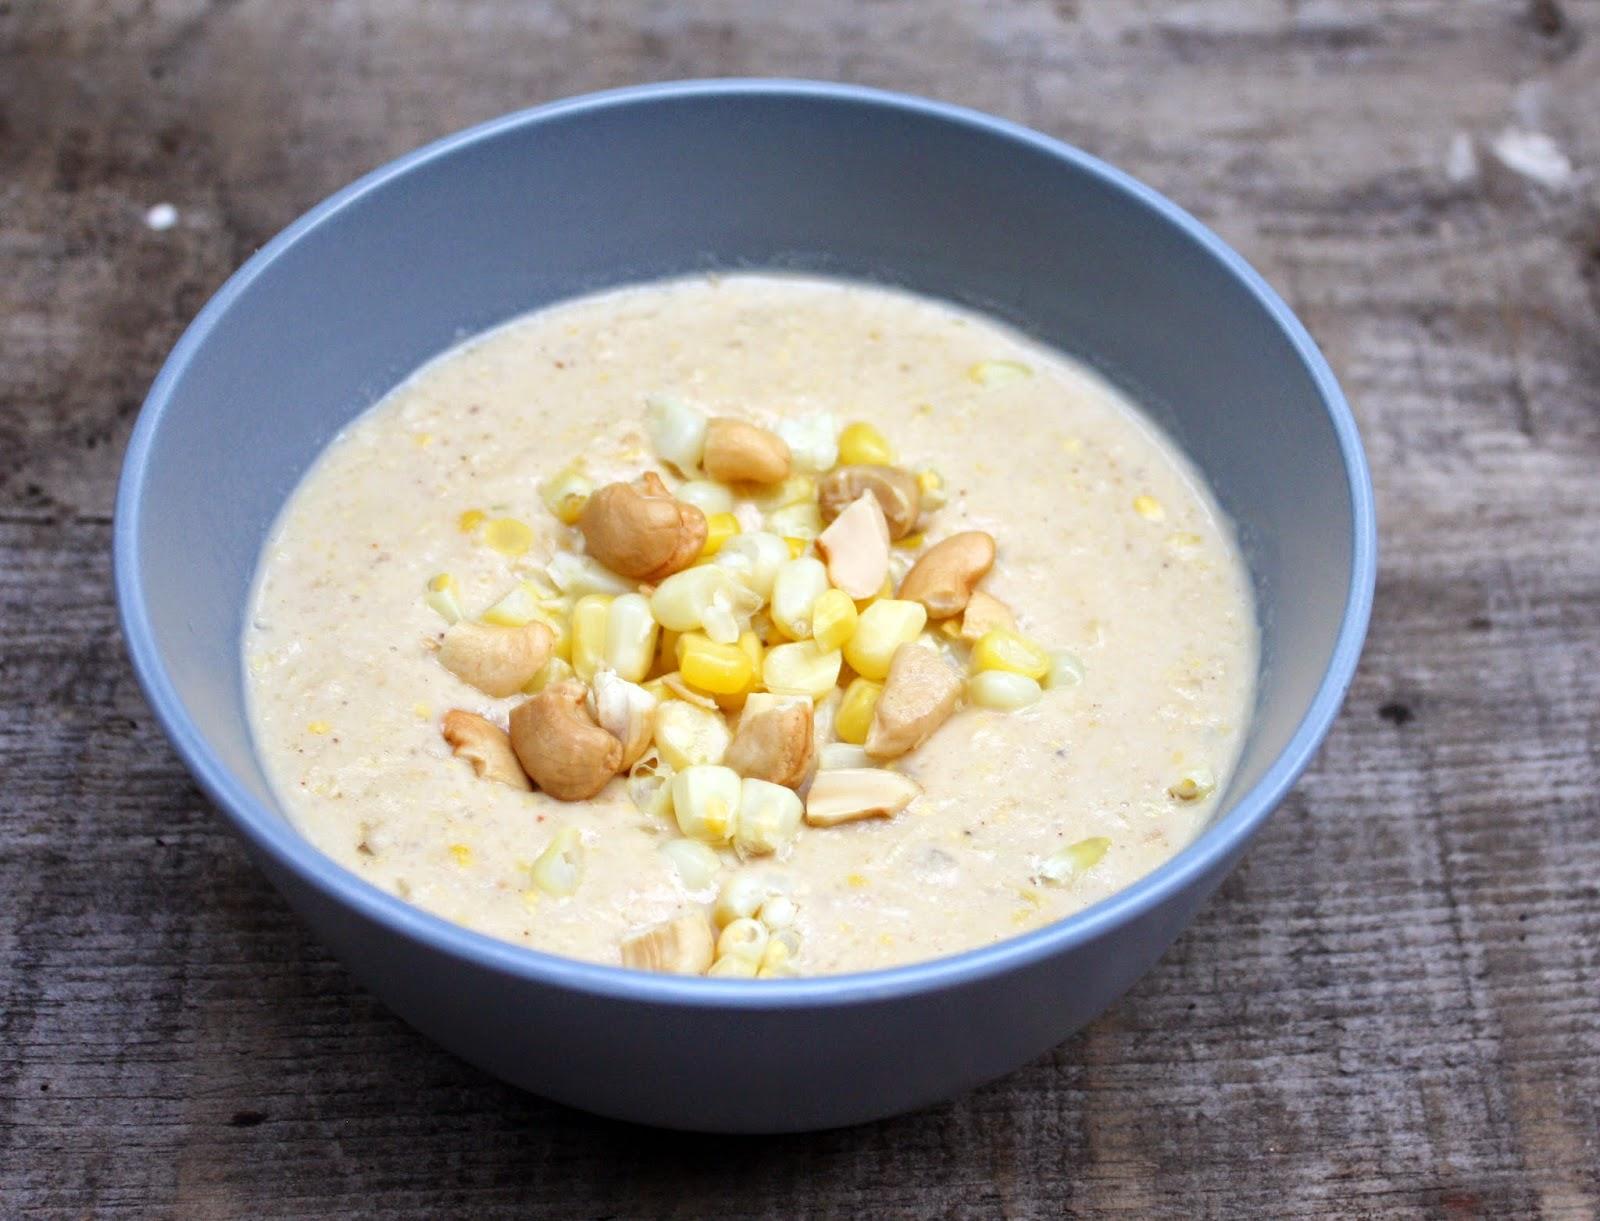 Dairy-free, vegetarian, vegan Cashew Corn Chowder